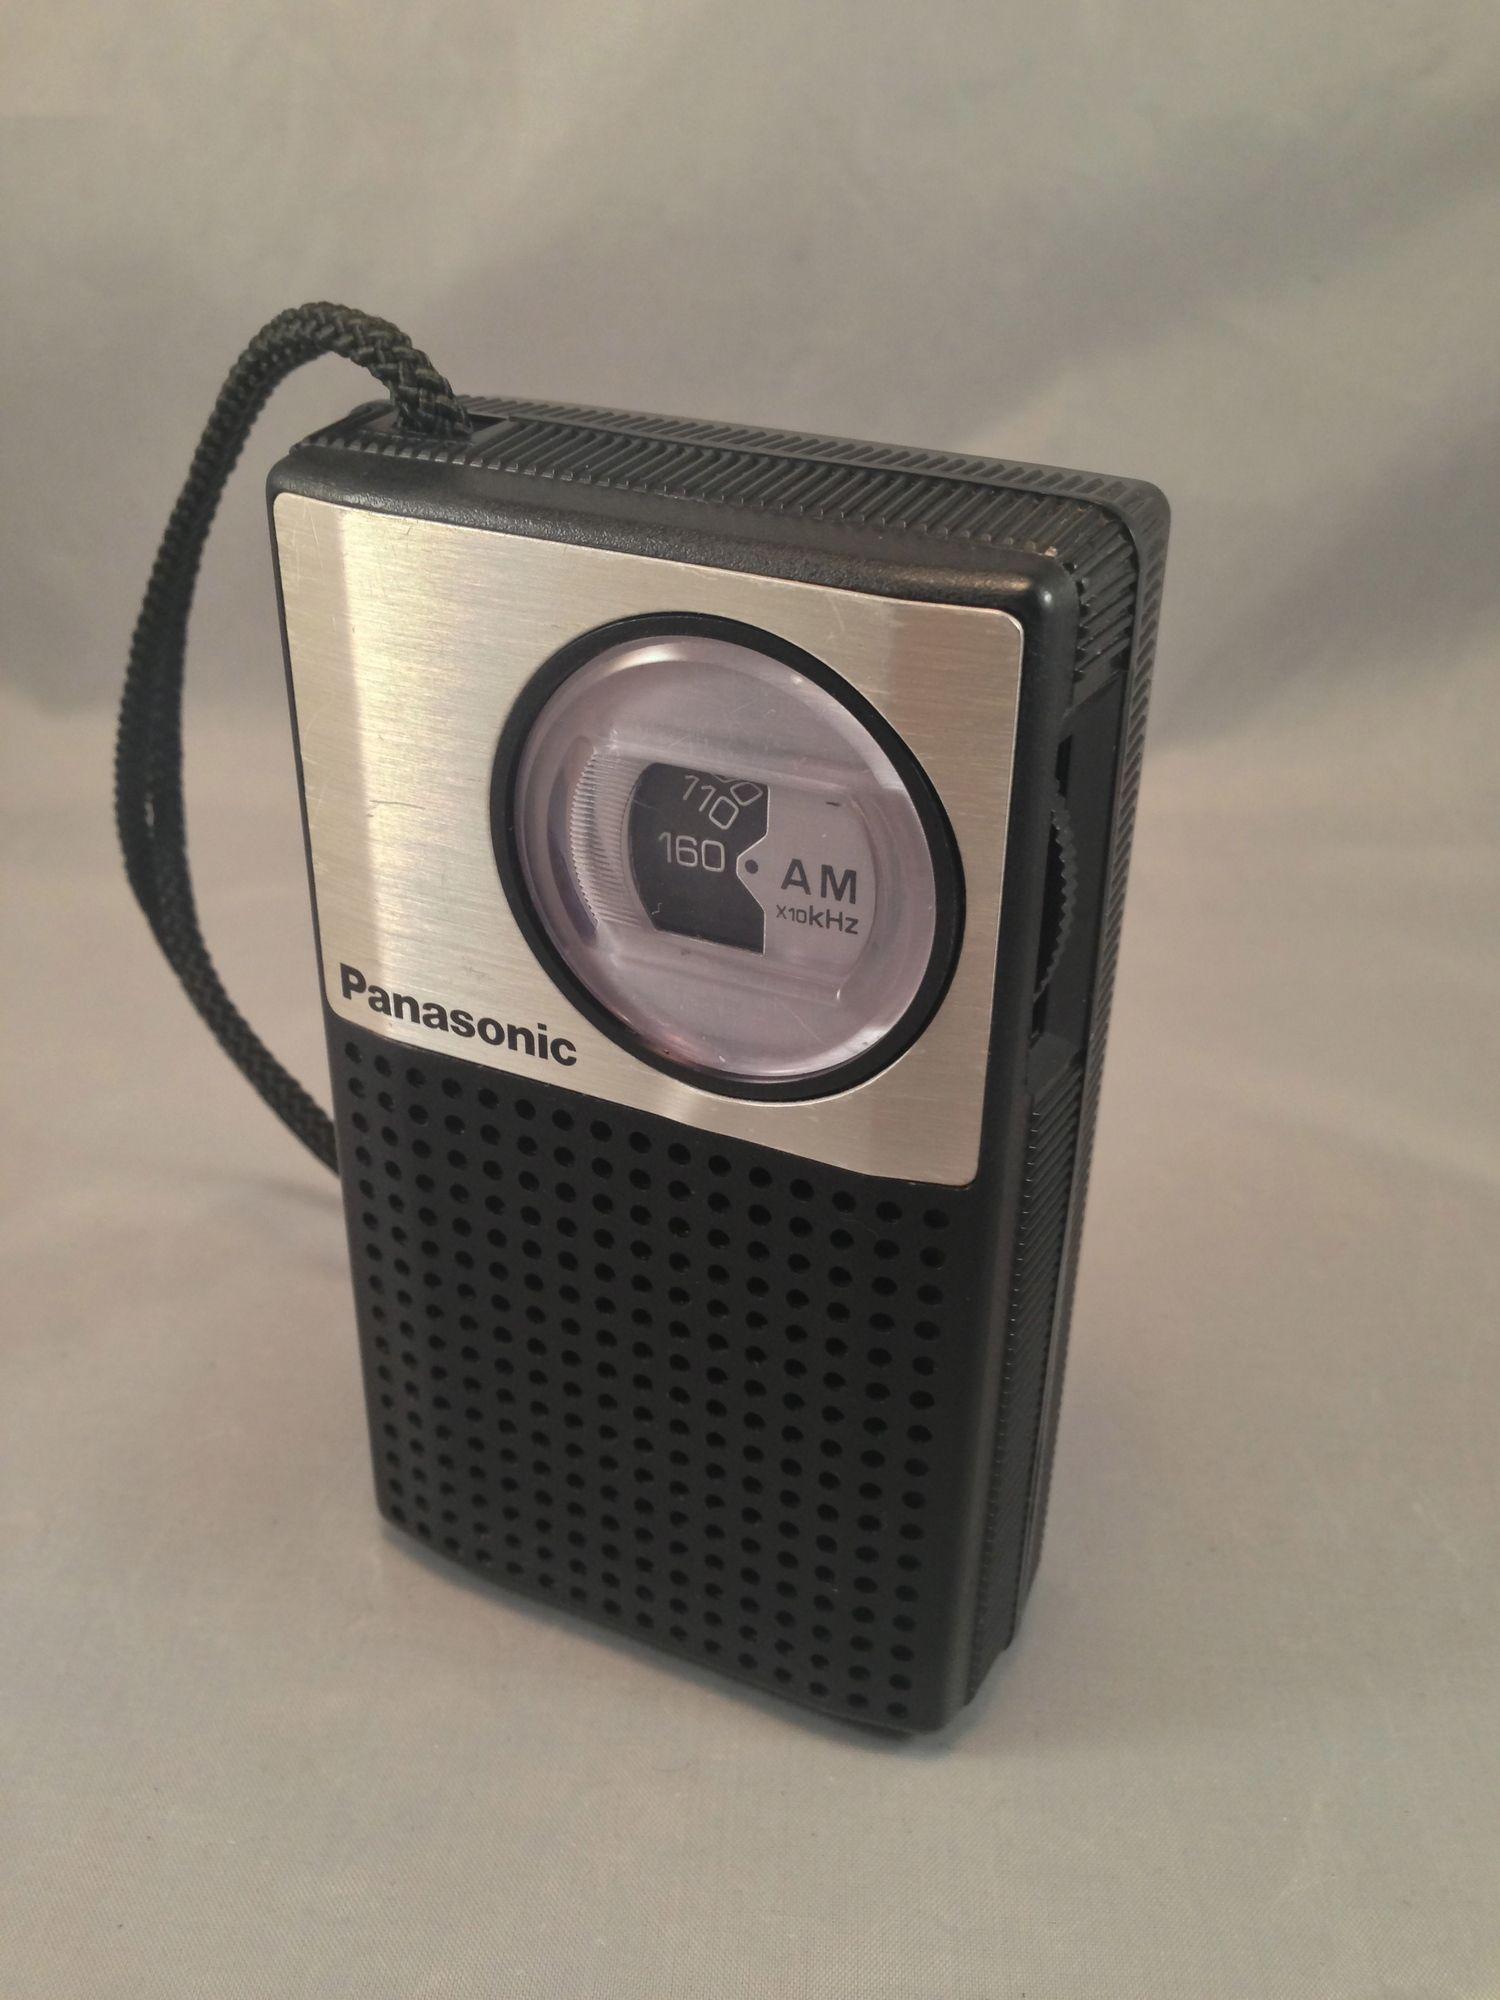 Vintage Panasonic Am Pocket Radio Model R 1018 Pocket Radio Vintage Radio Old Radios